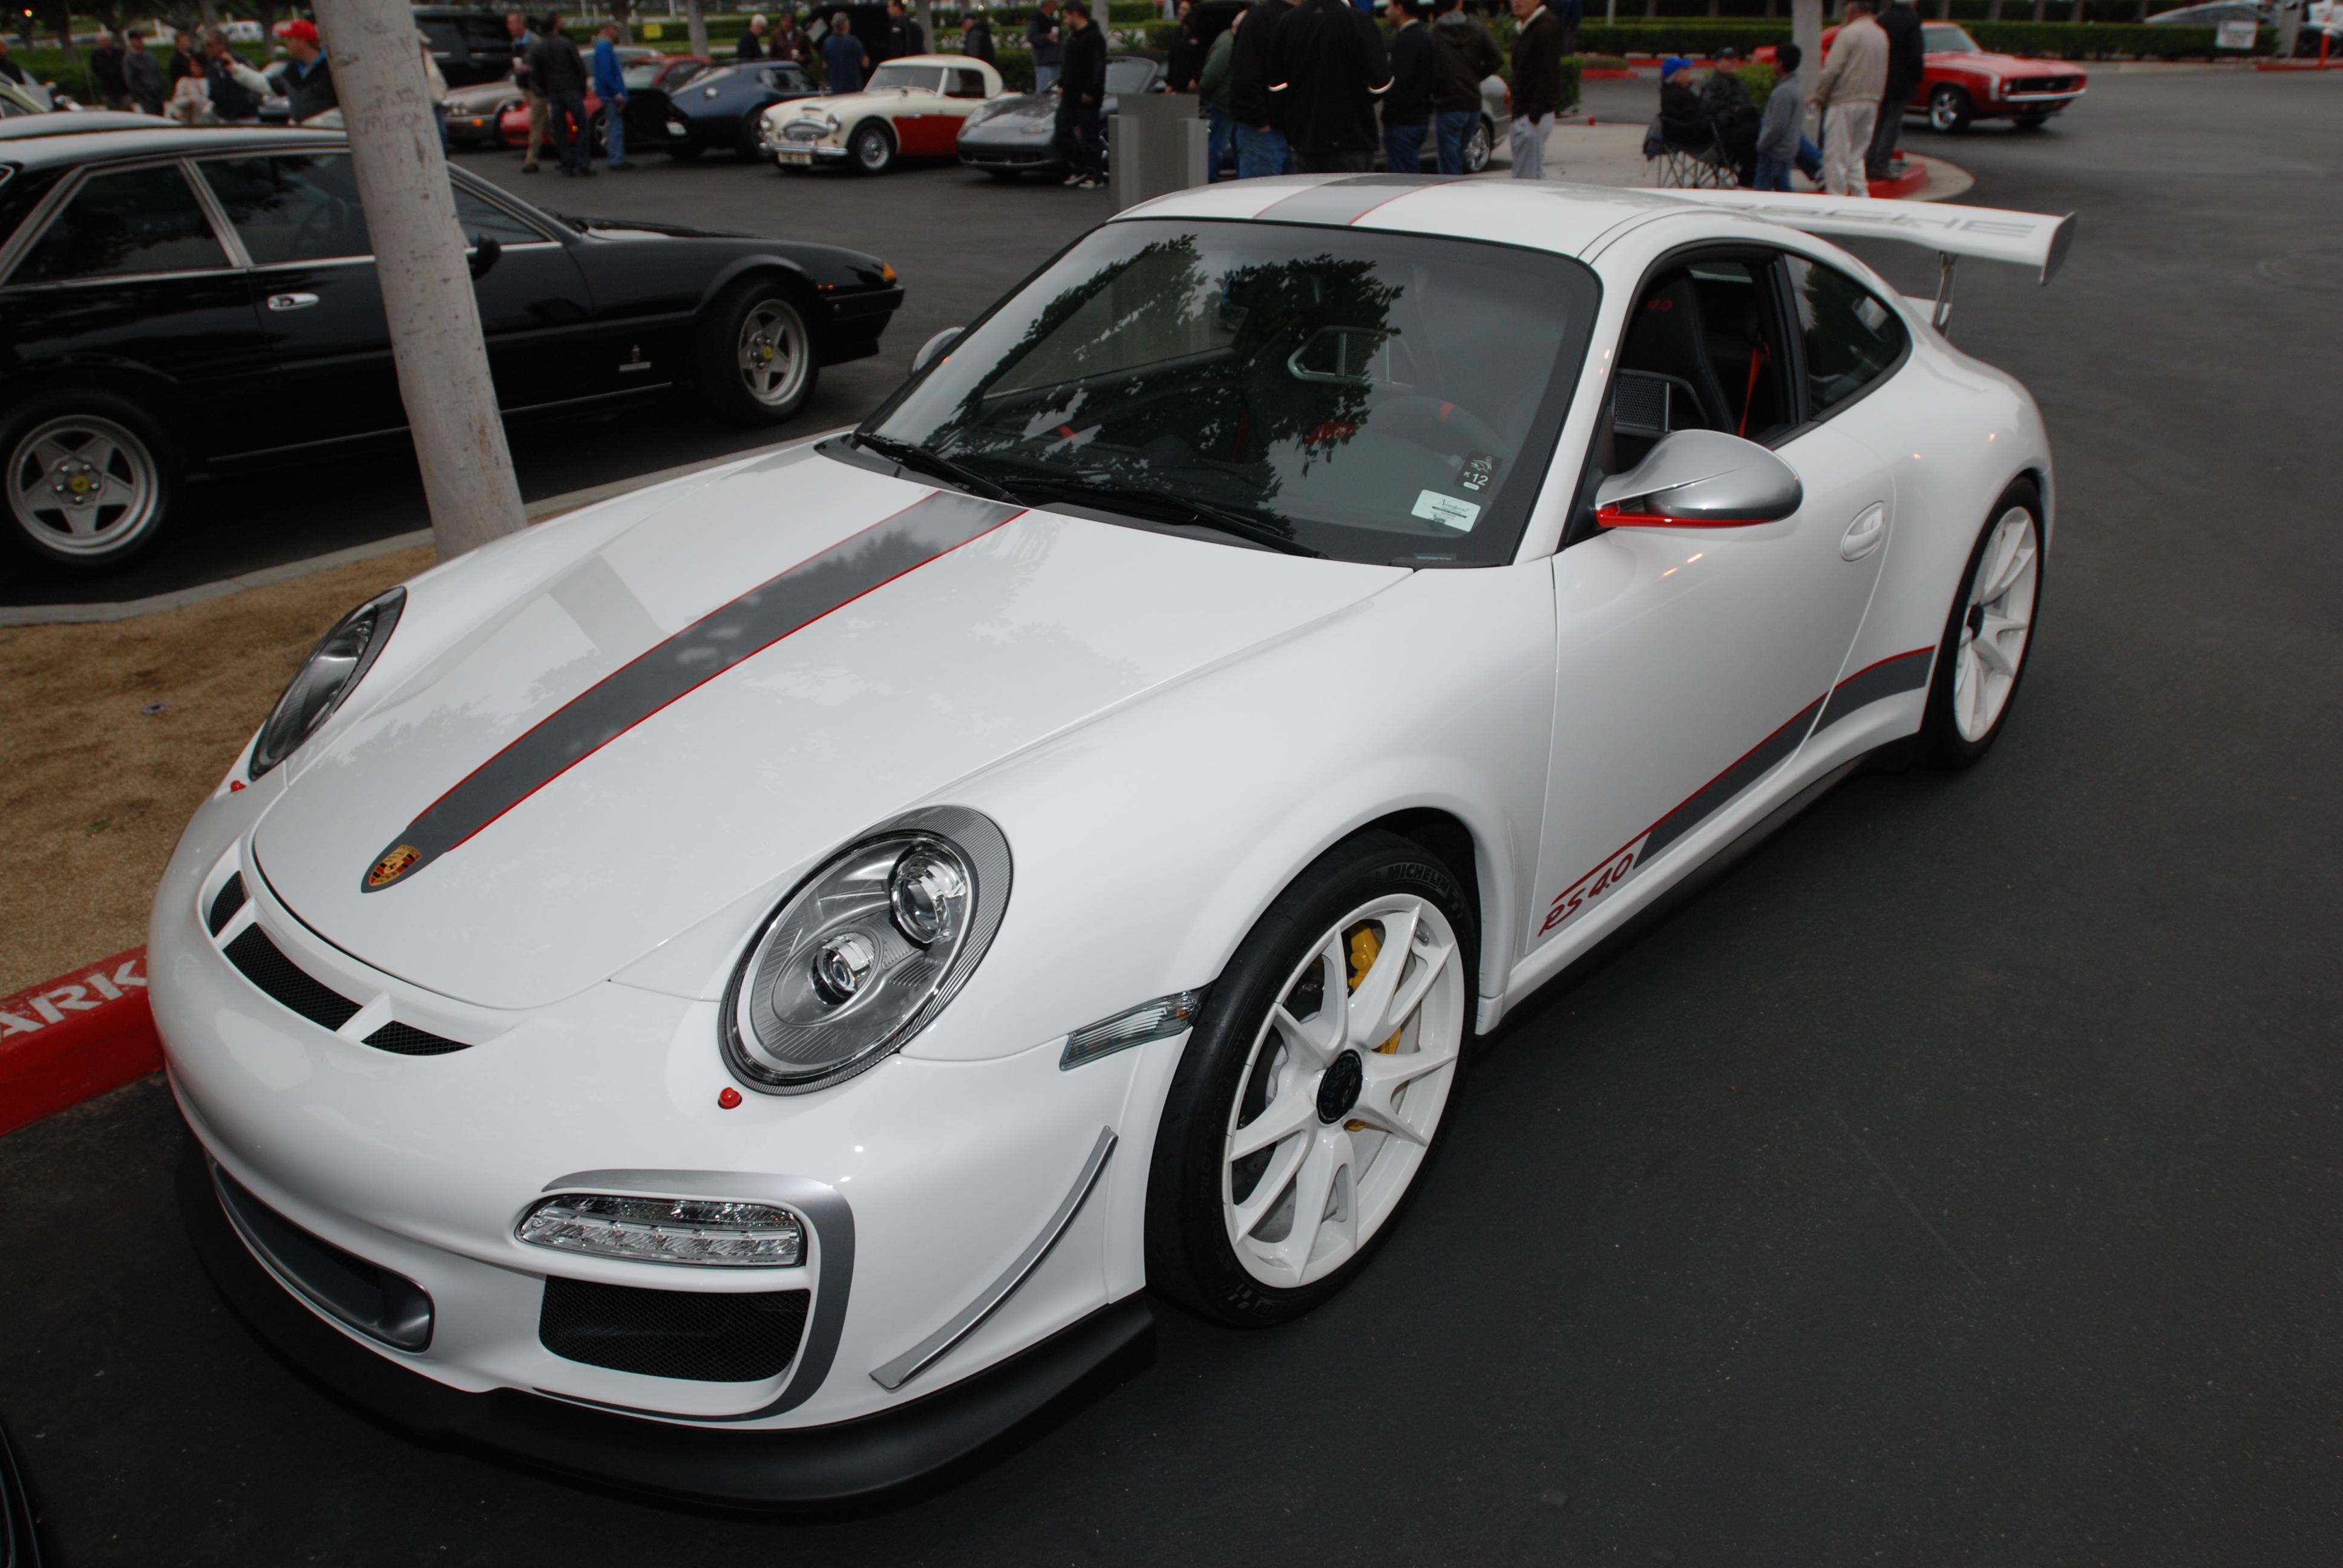 Of Speedsters, Spyders, Porsche GT3 RS4.0's, and more… | digitaldtour